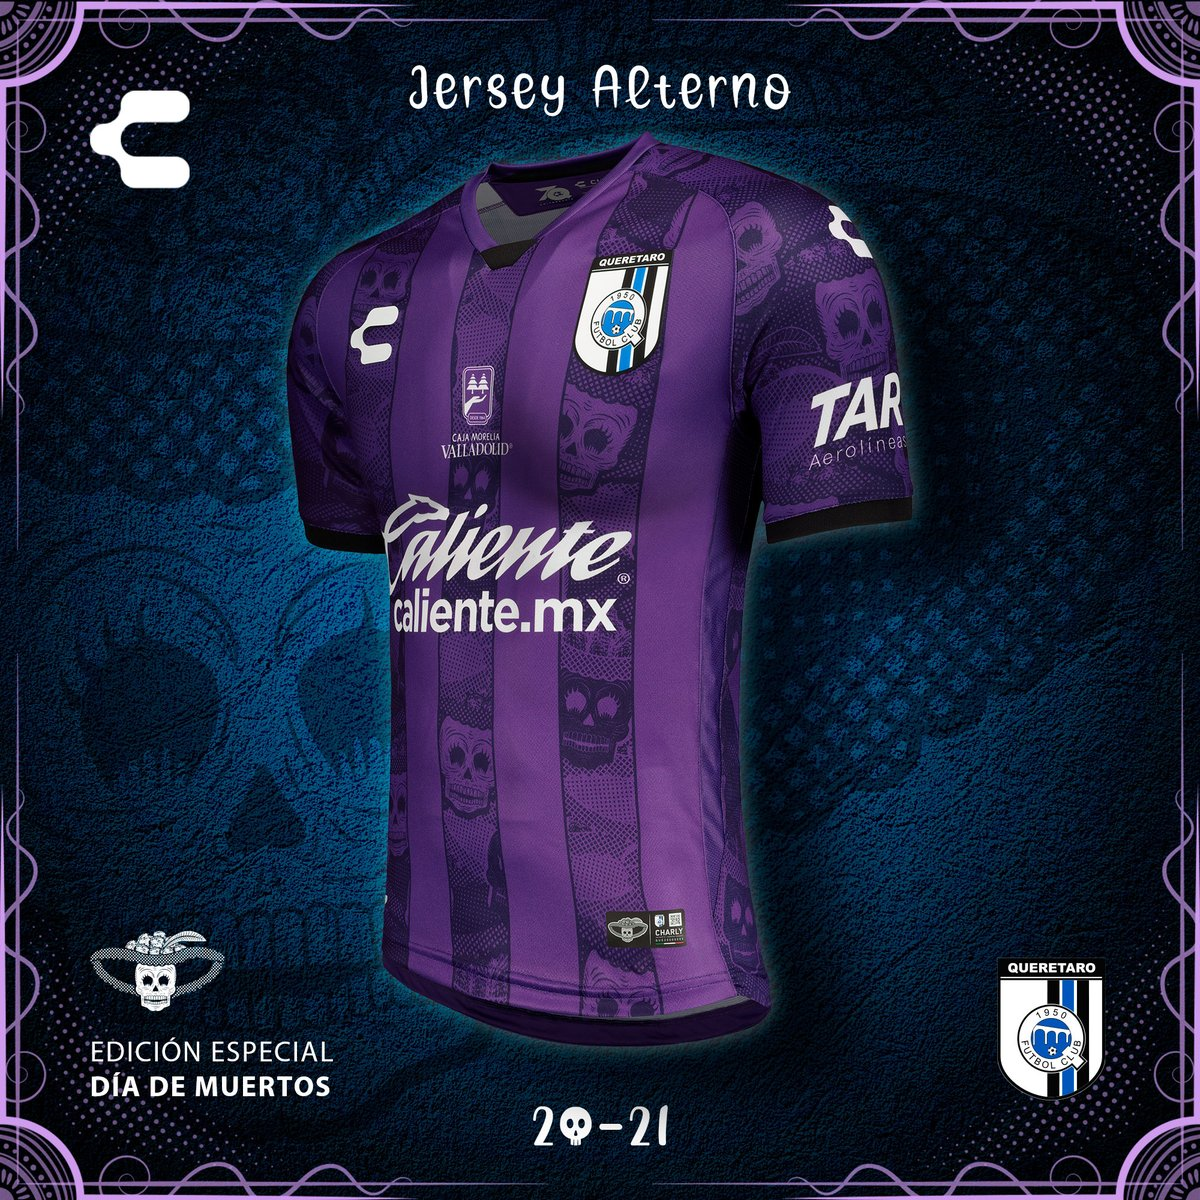 Camisa Dia de Los Muertos do Querétaro 2020 Charly